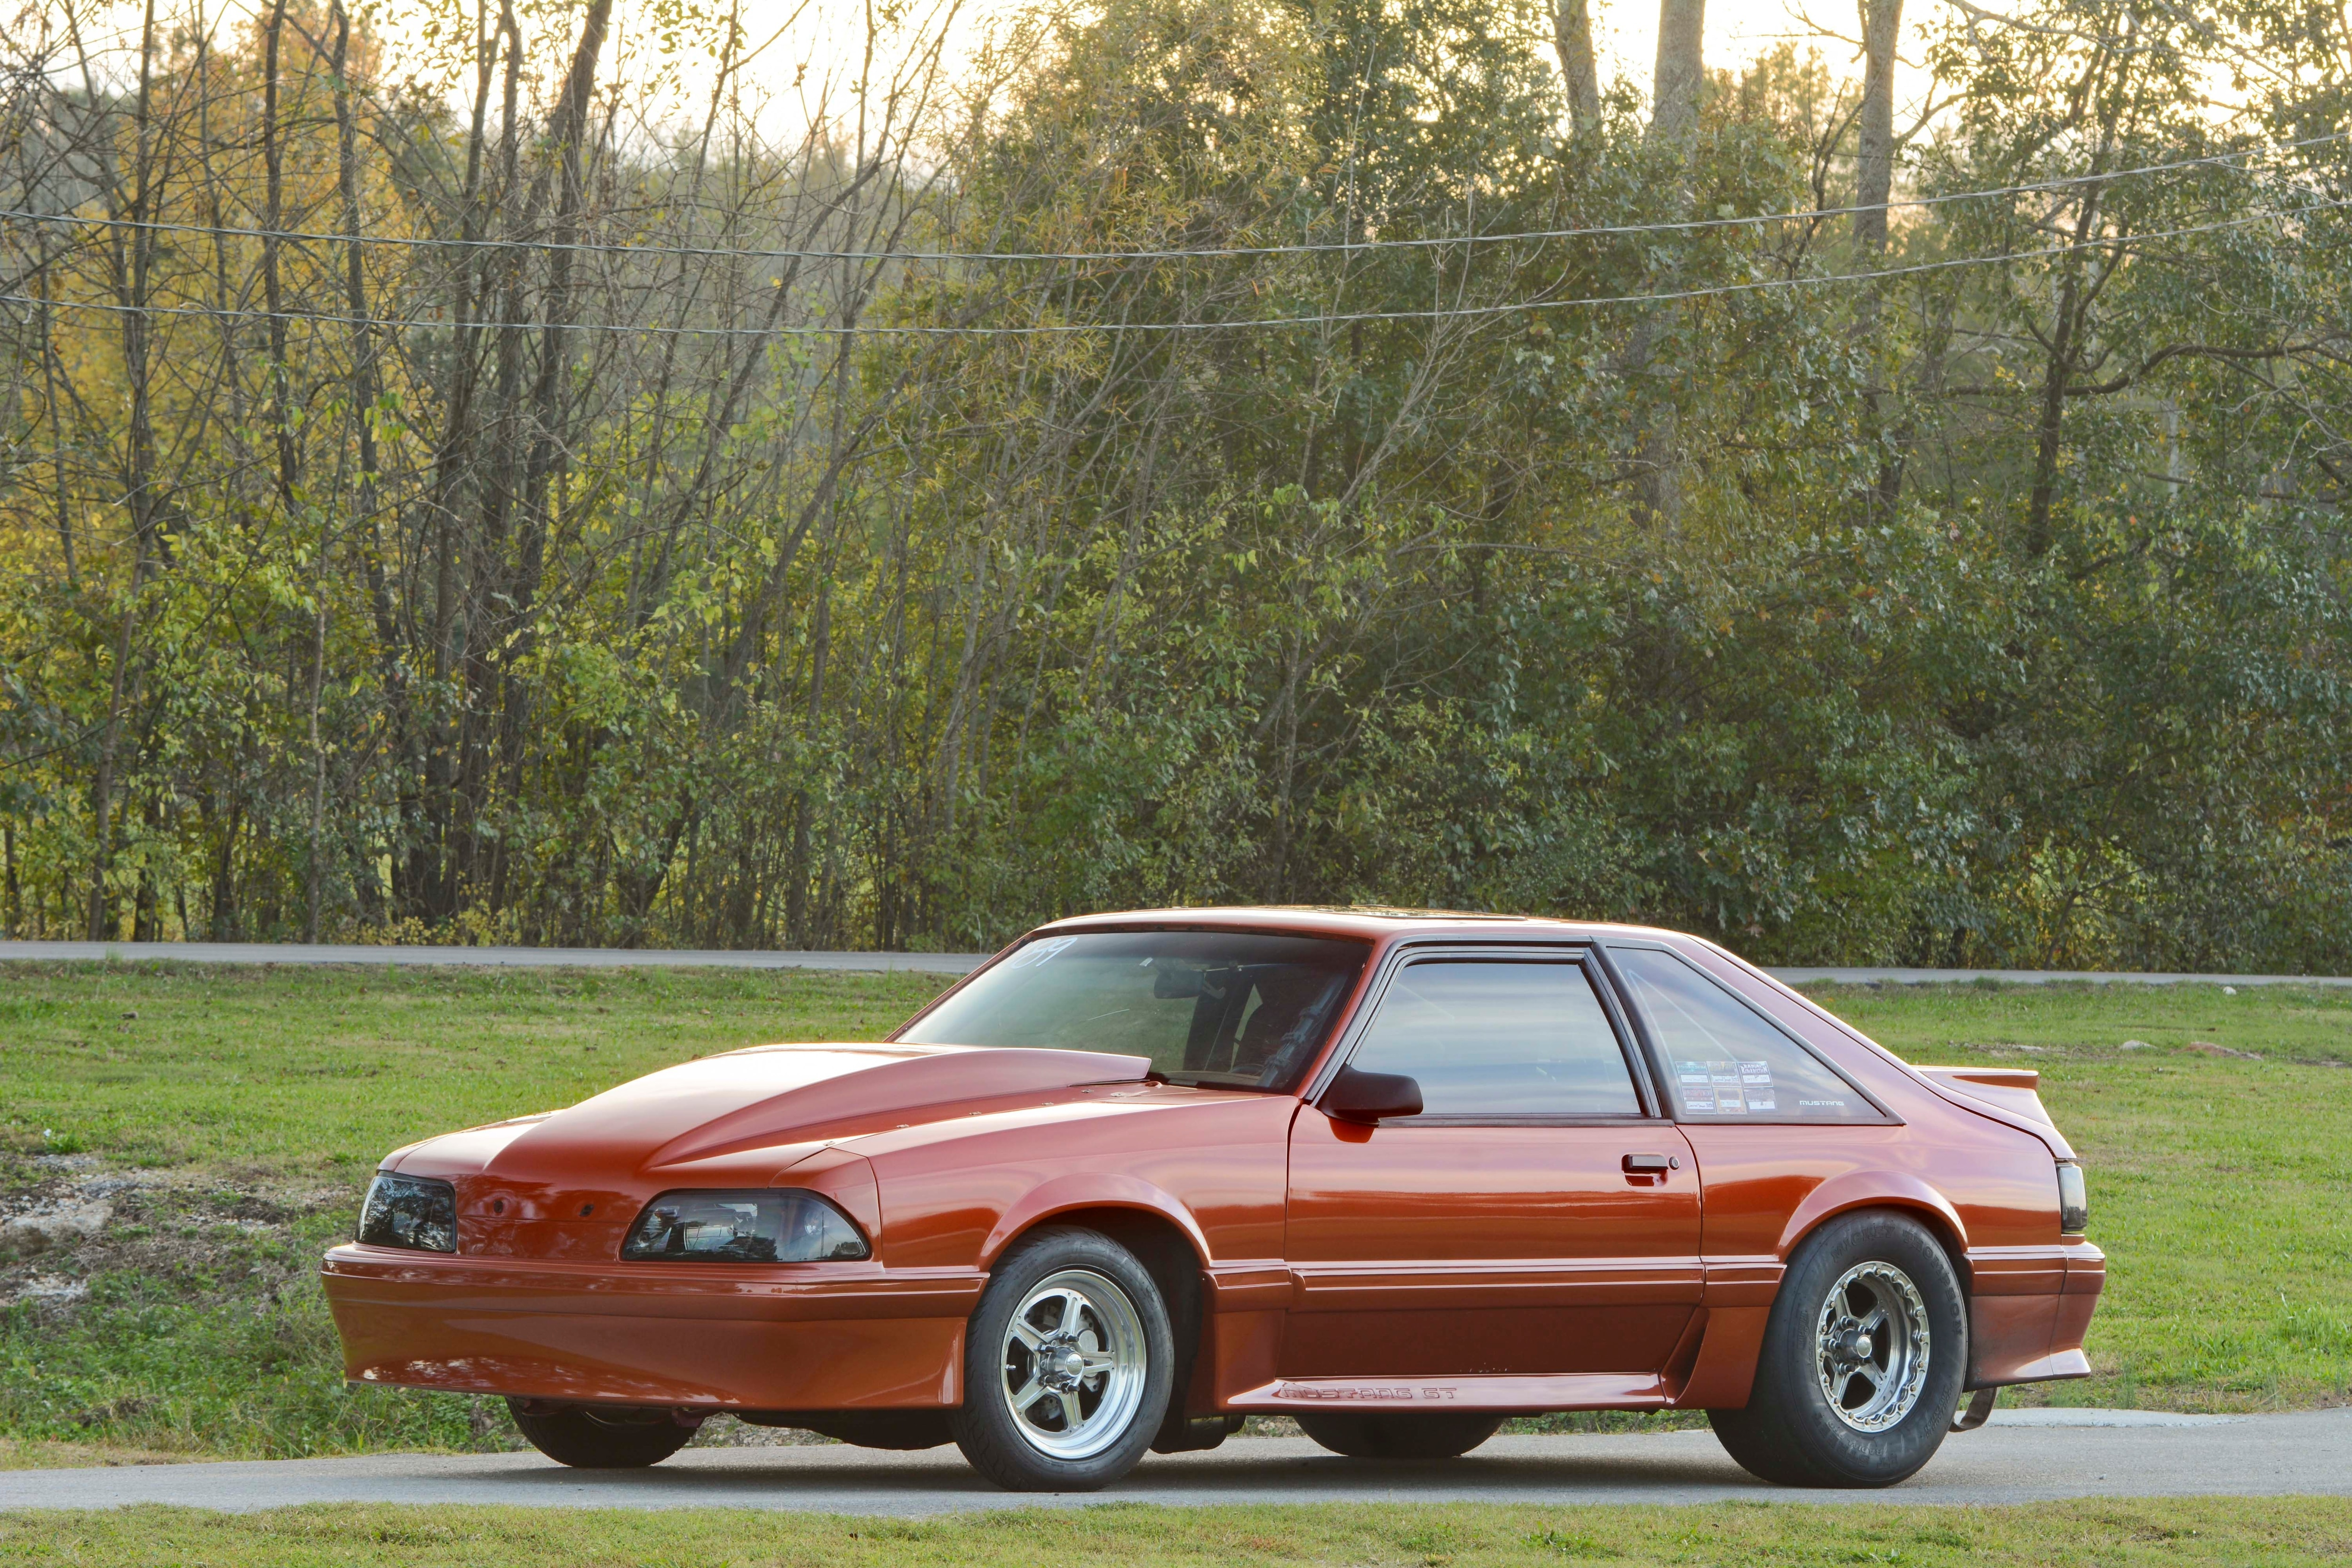 028 Orange Procharged Mustang Overalls